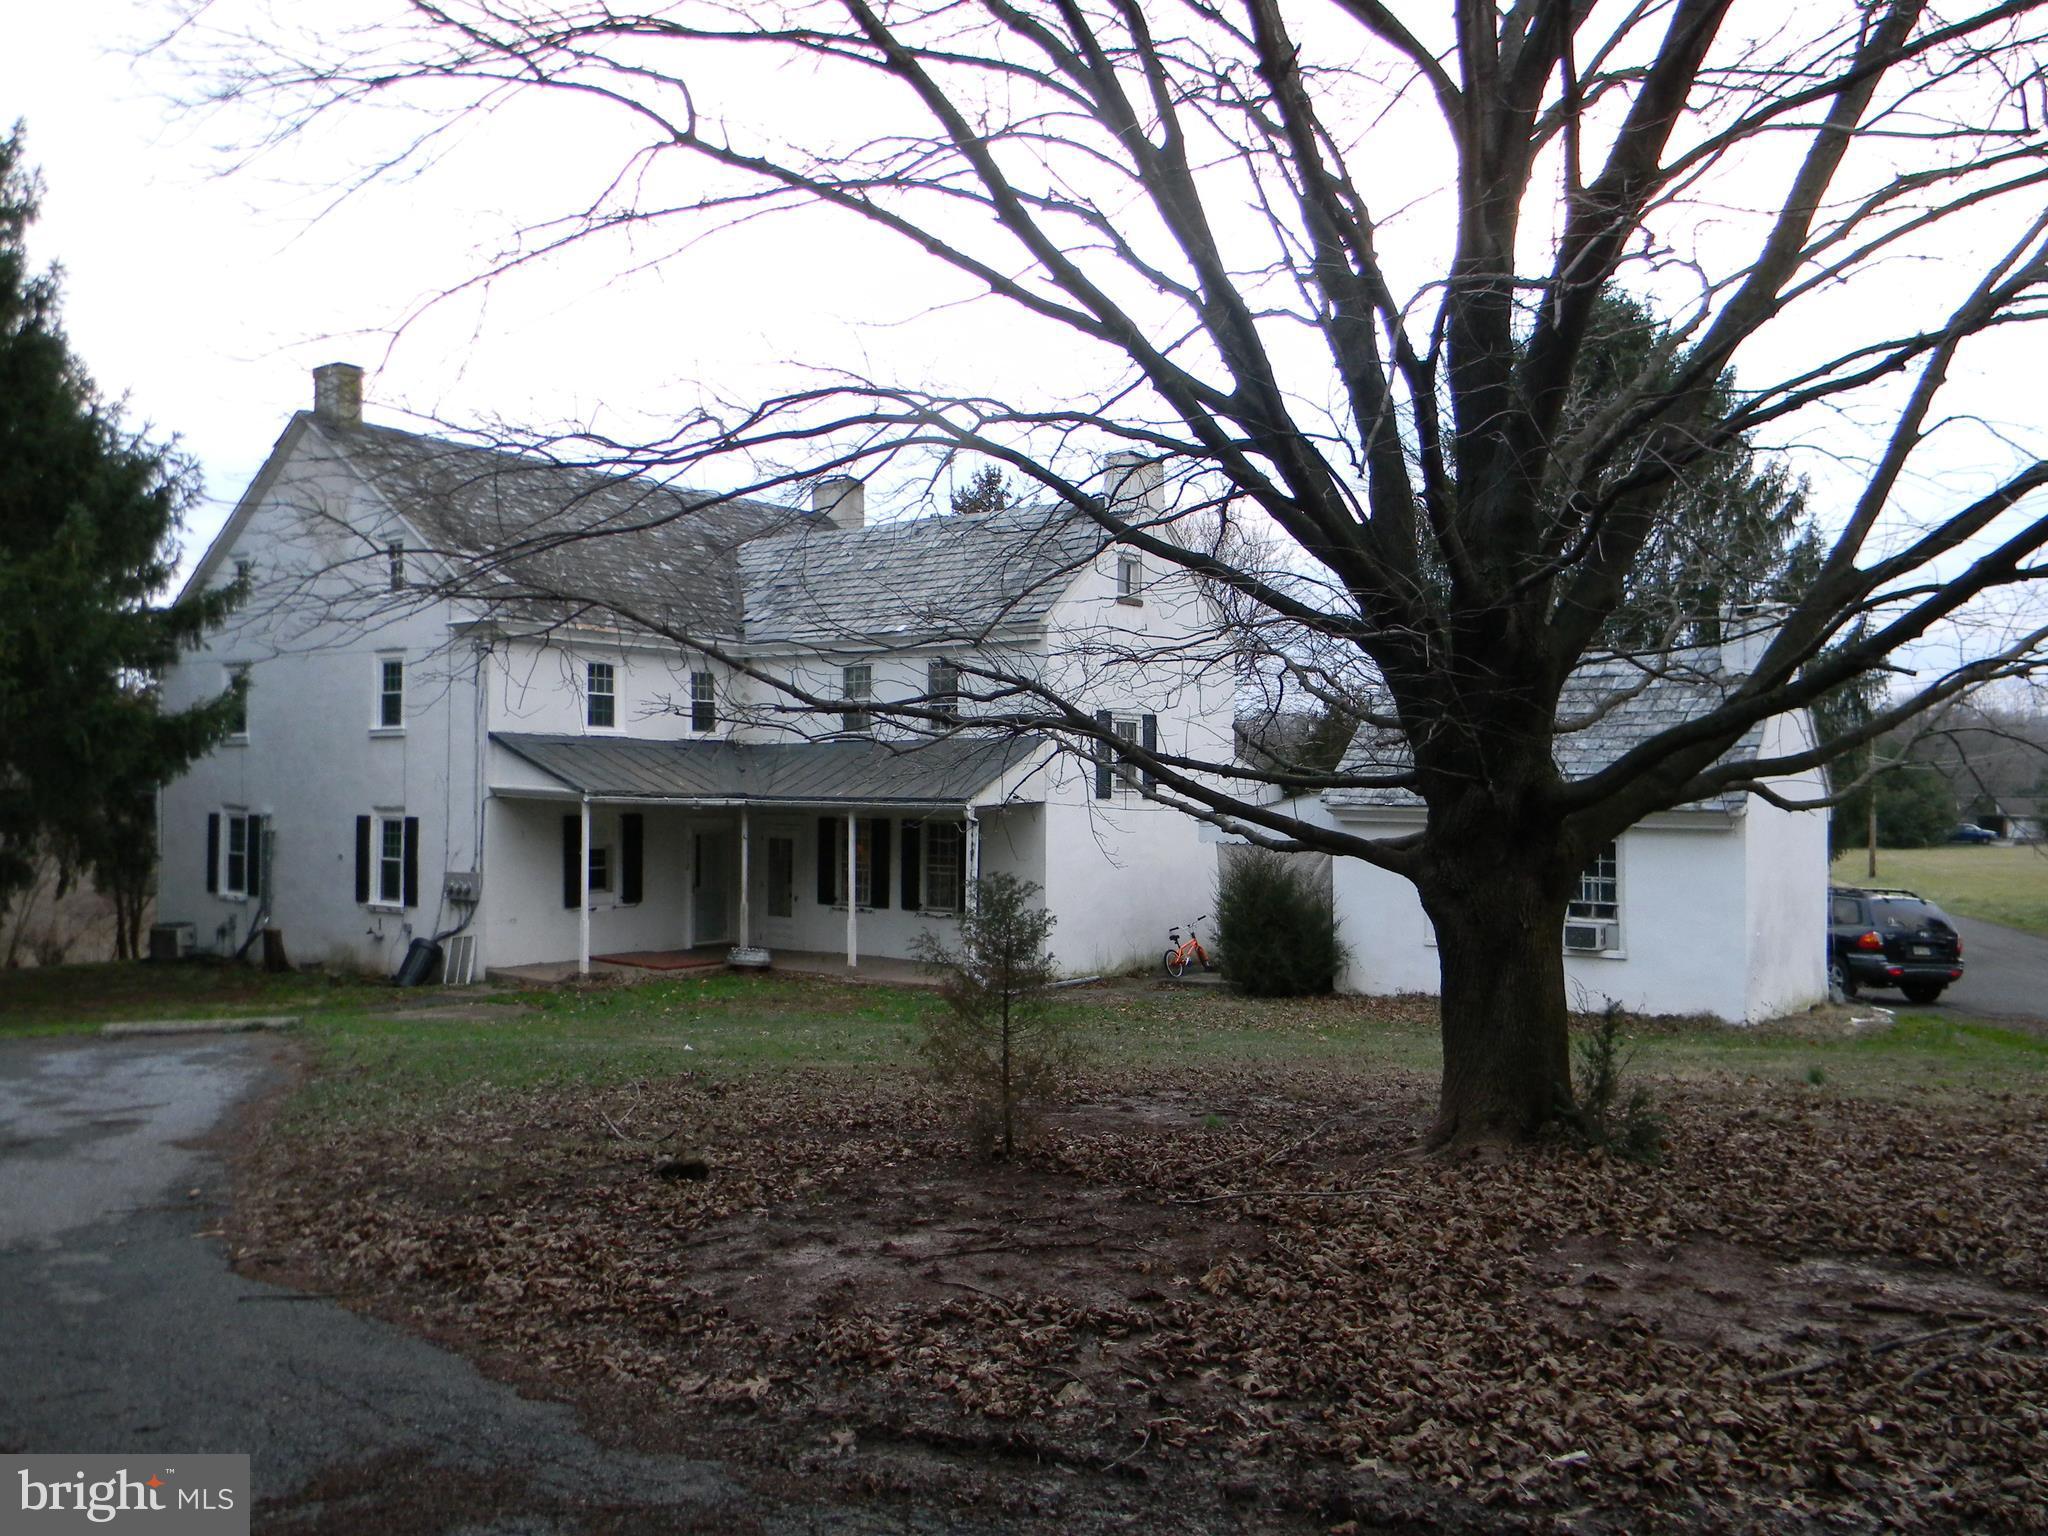 1110 LANDIS ROAD, EAST GREENVILLE, PA 18041